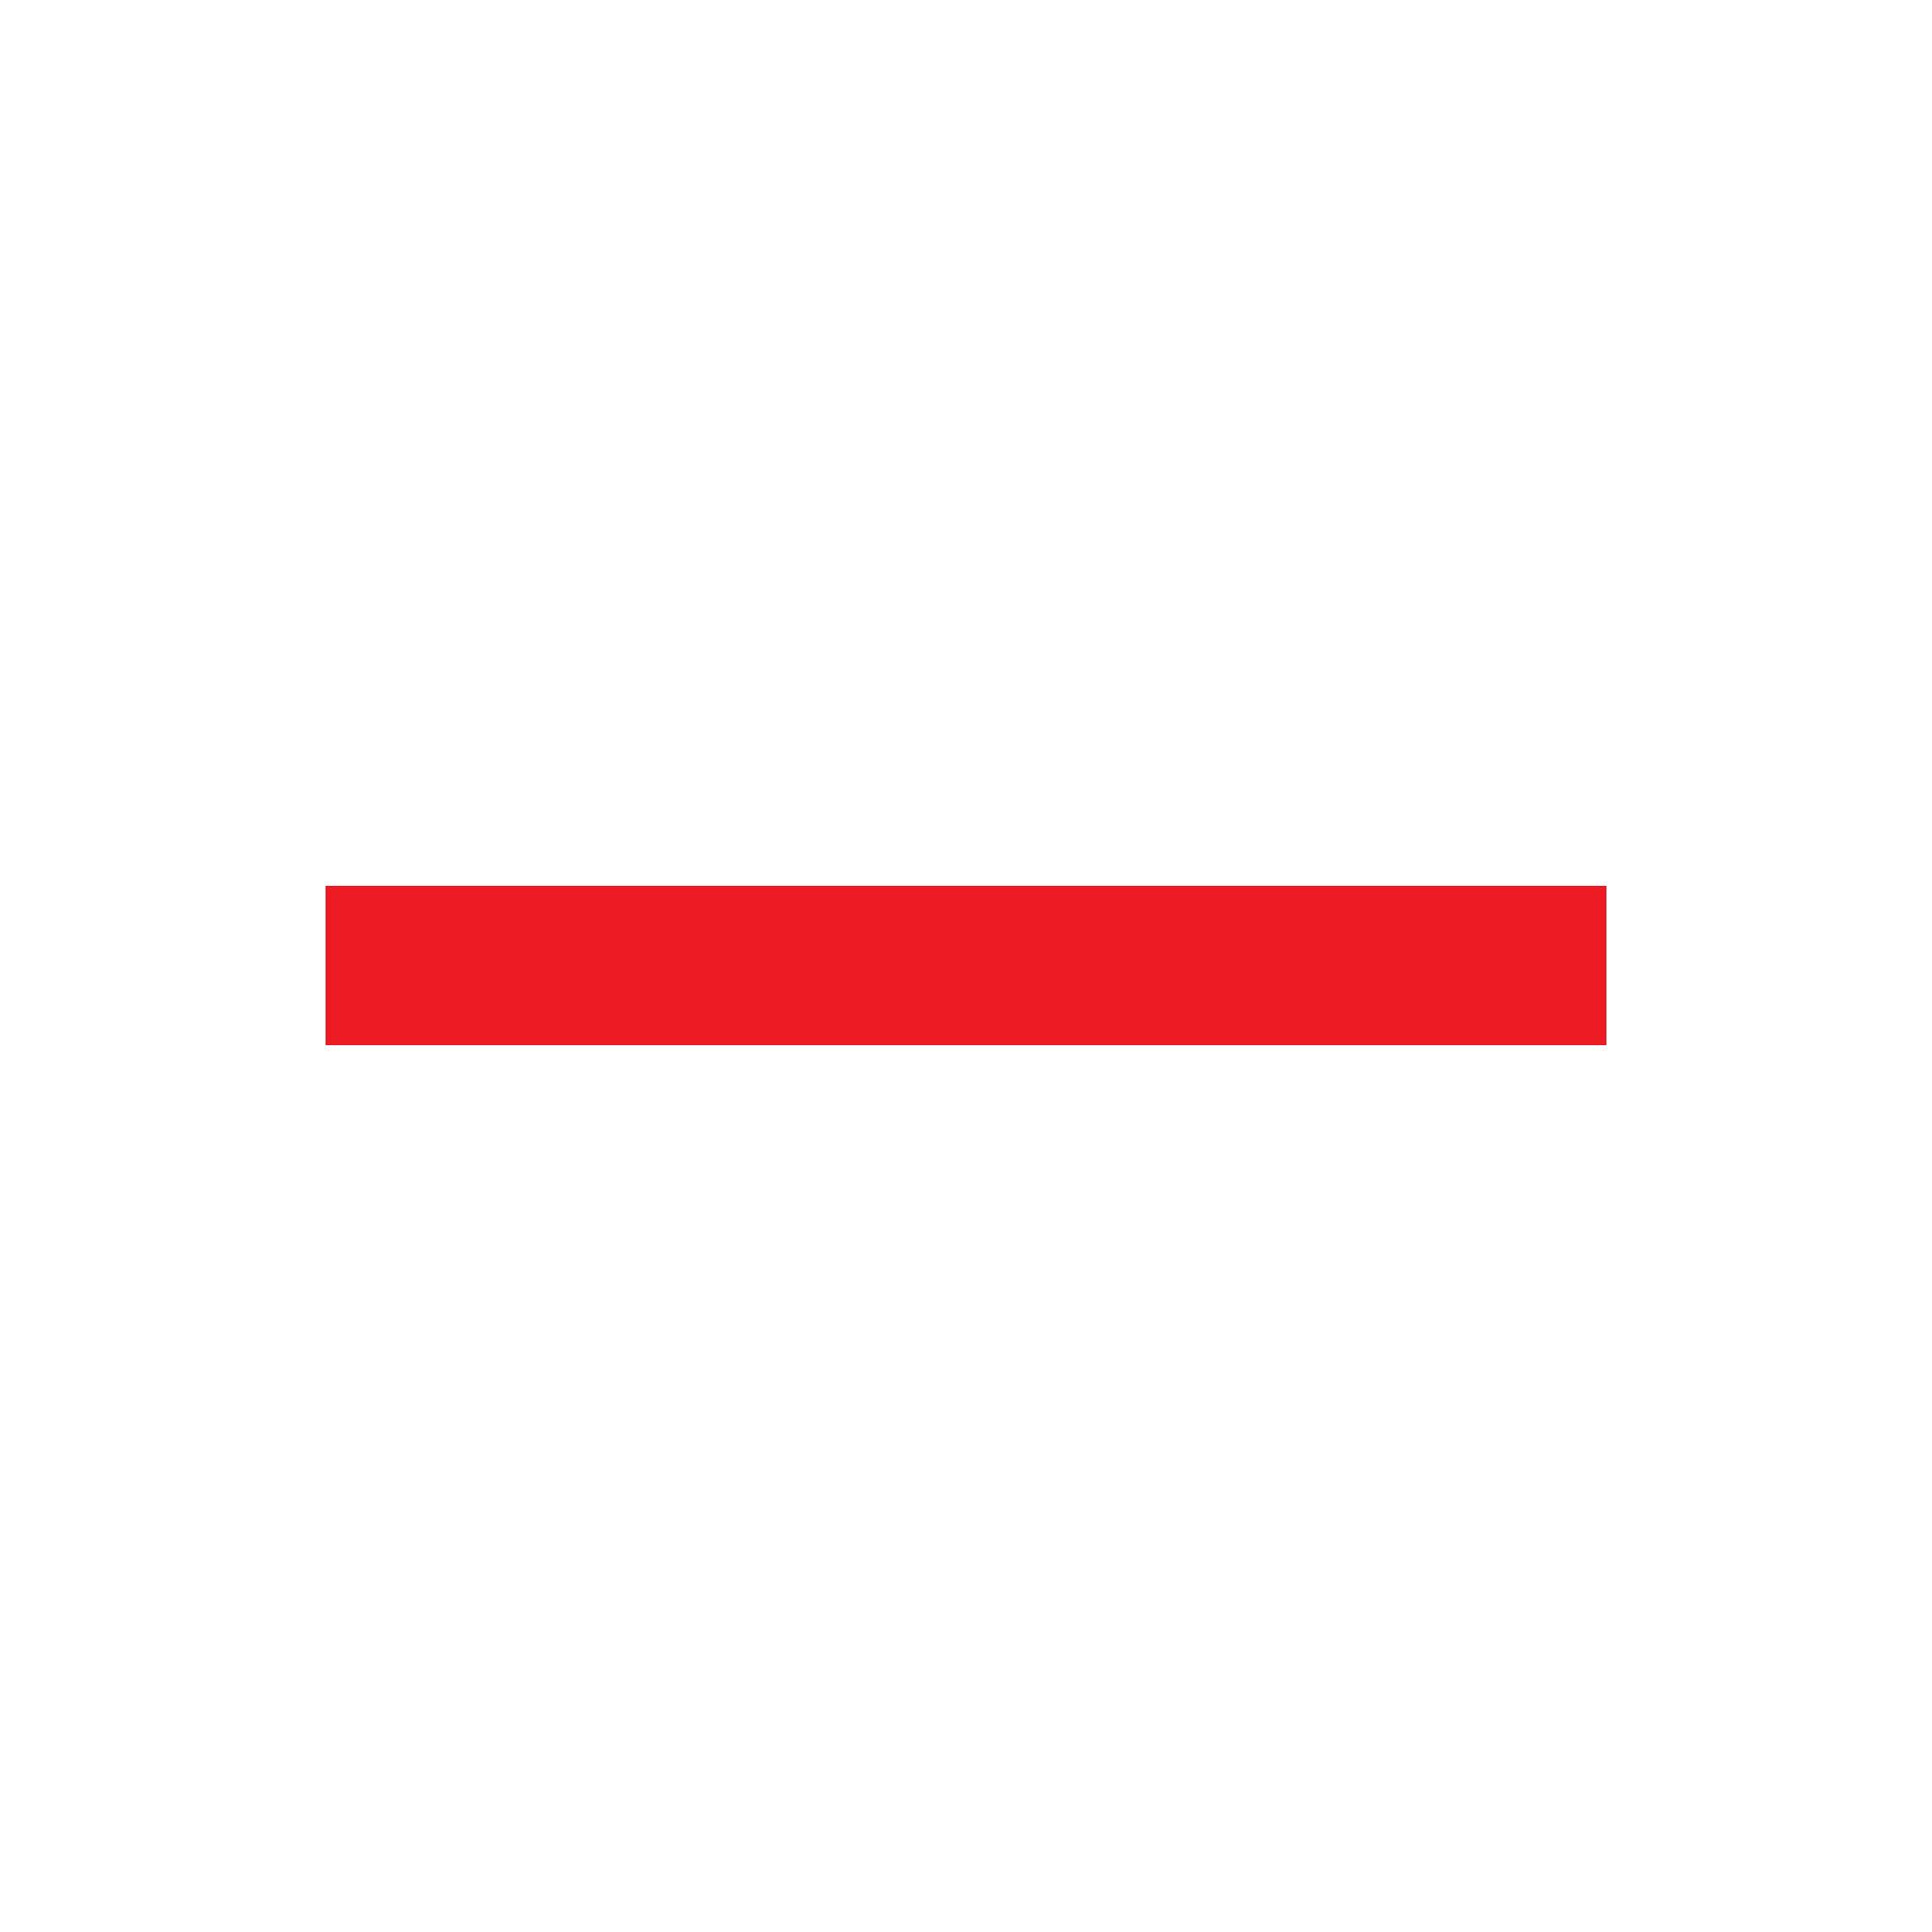 (주)웹젠